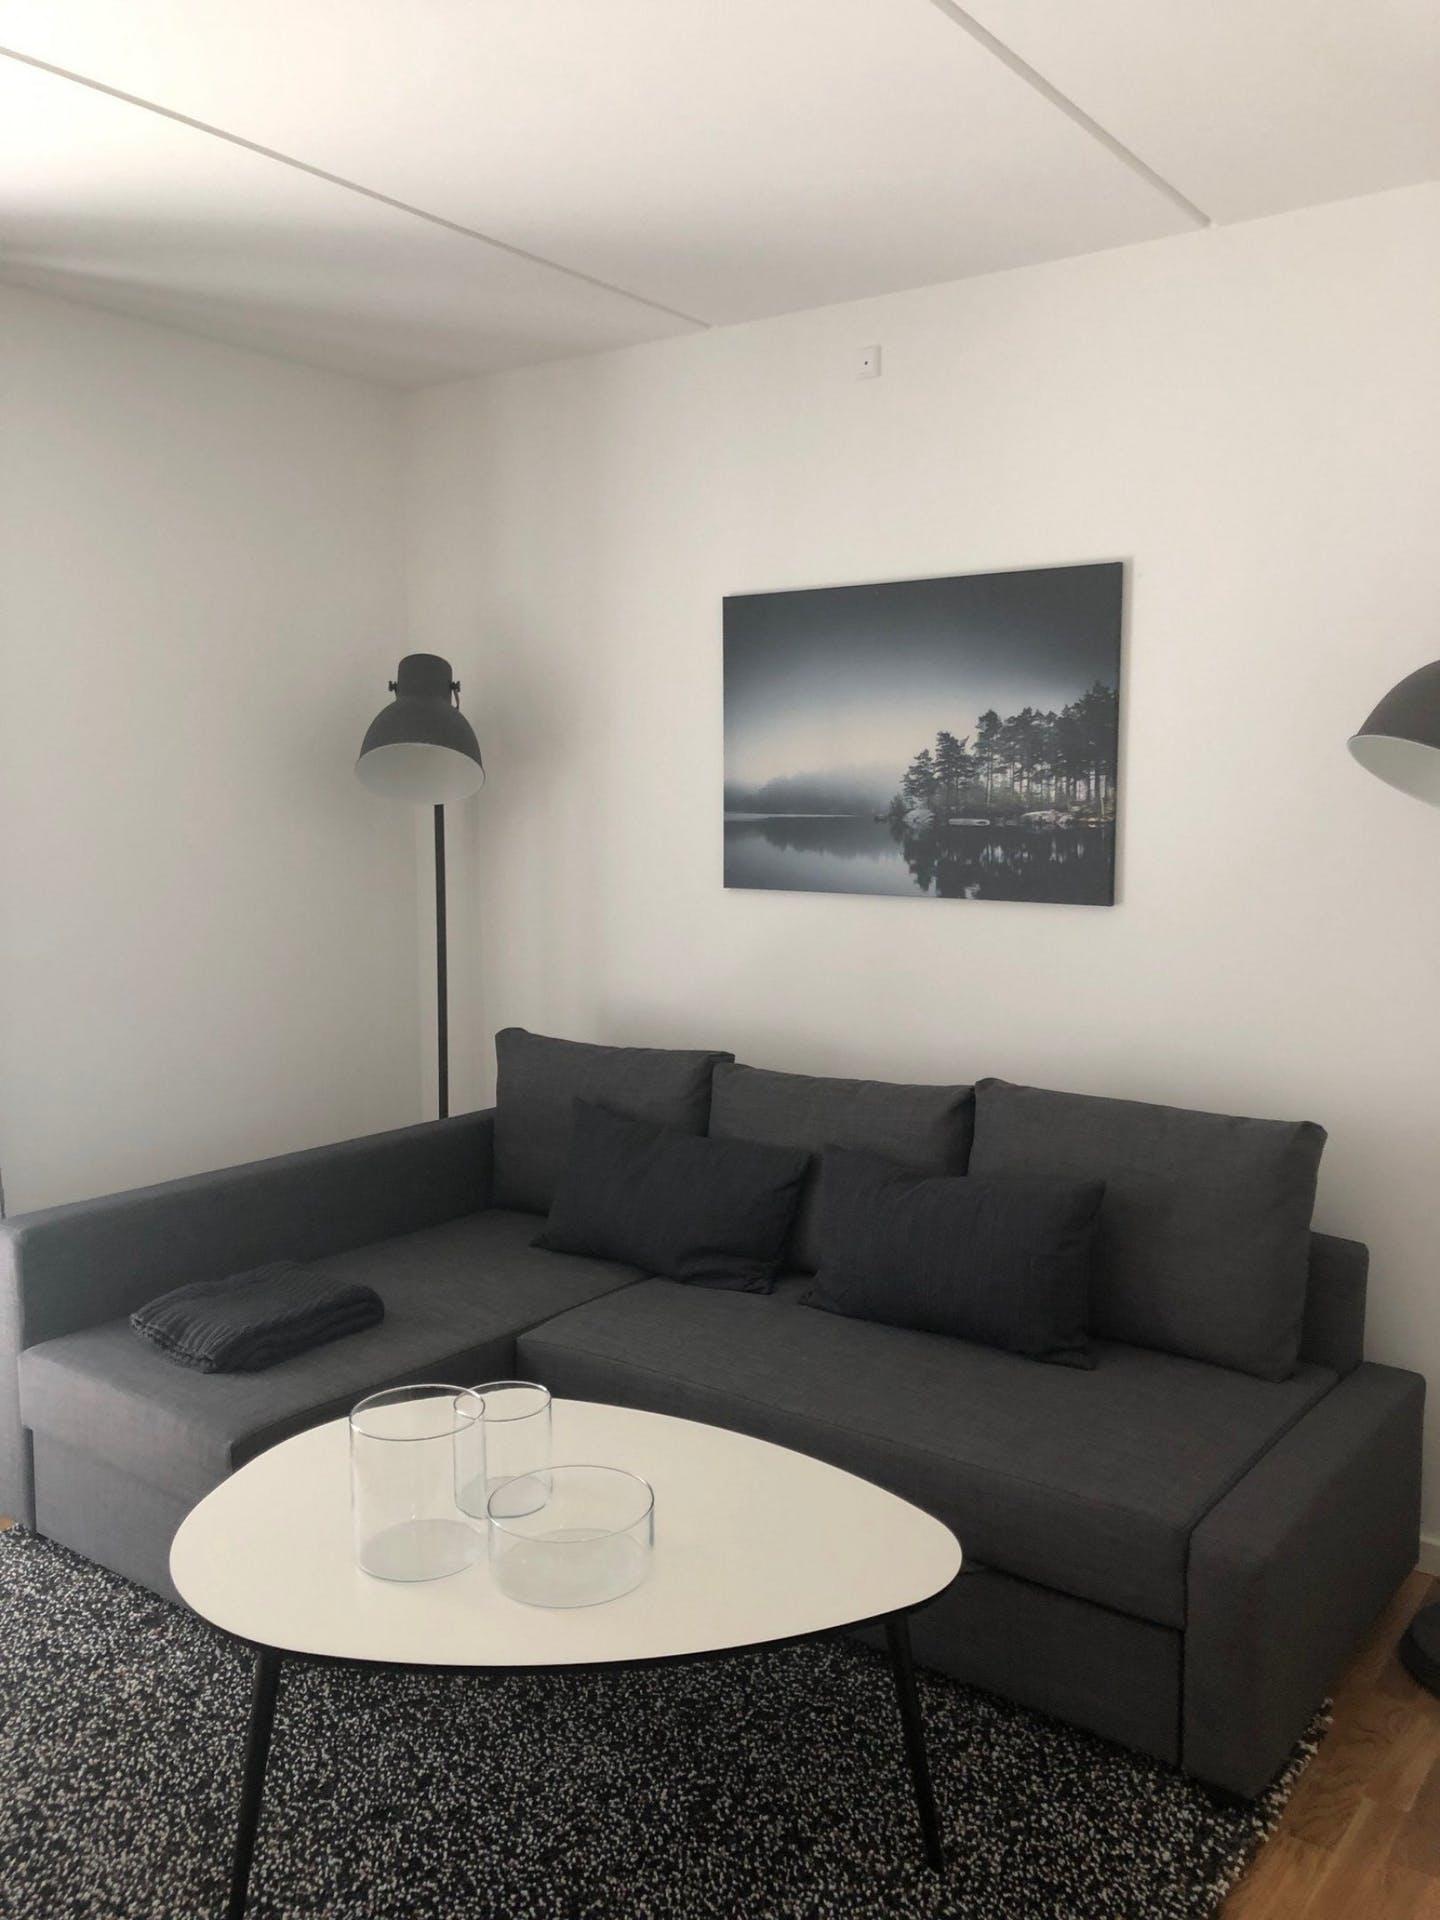 Lounge at Møllehatten 11 Apartment, Risskov, Aarhus